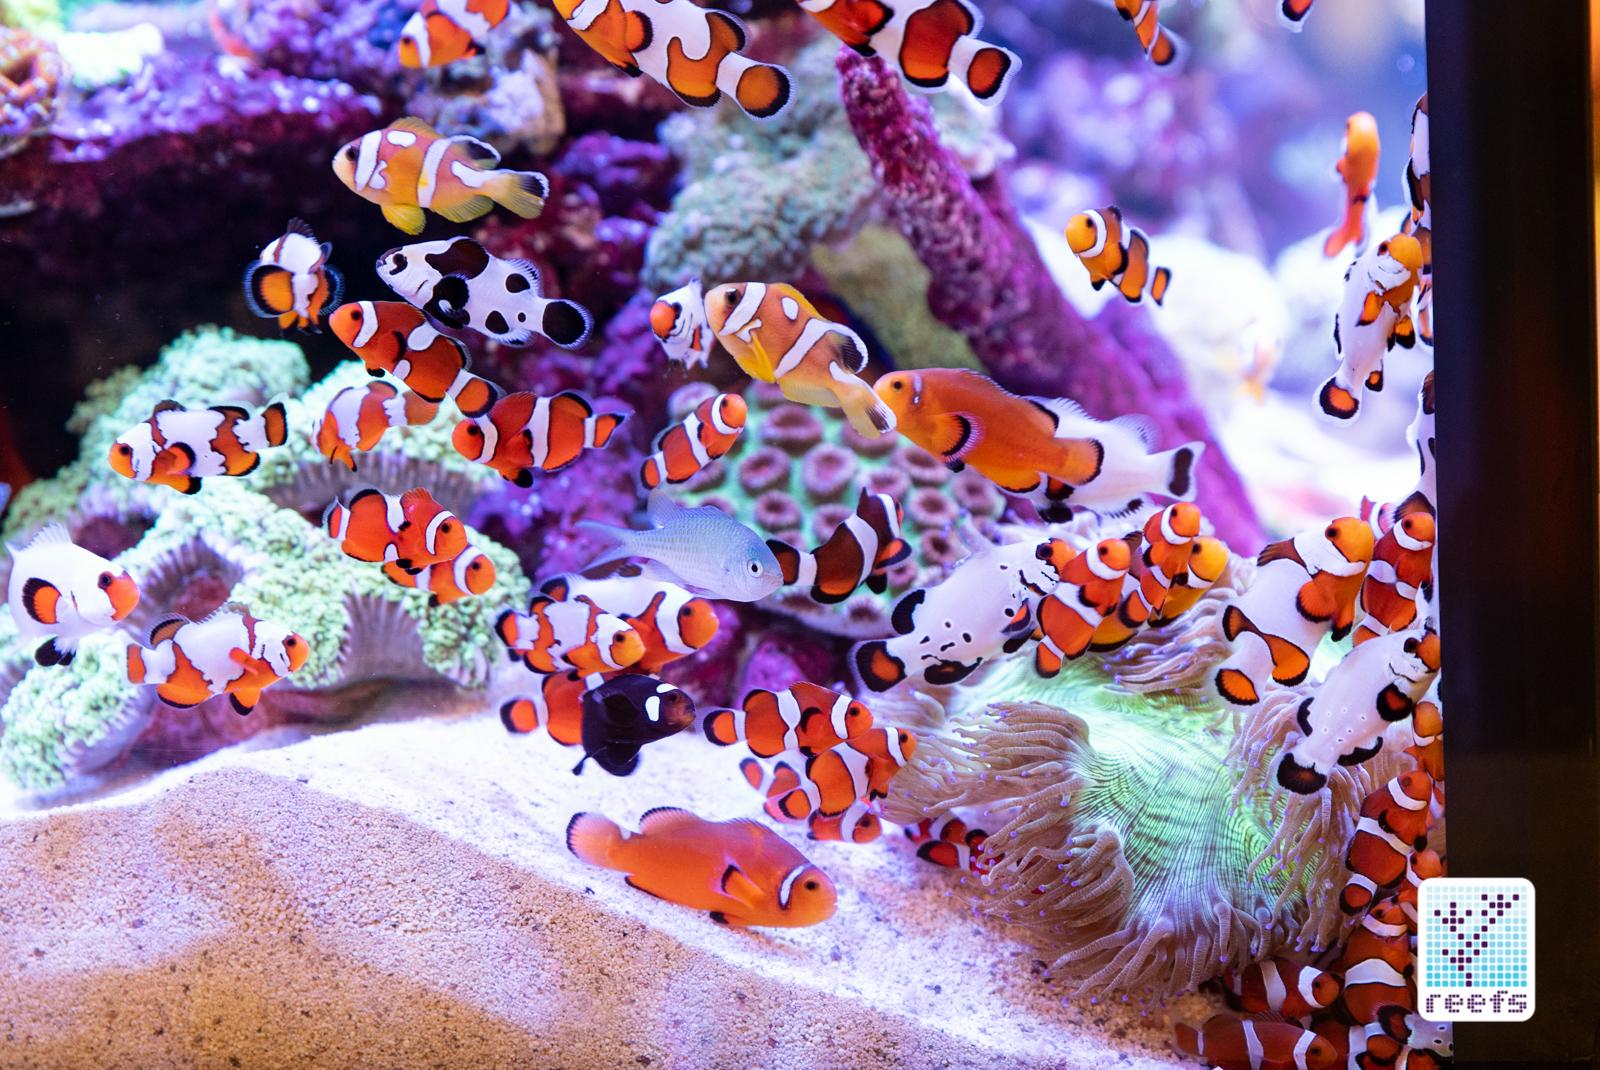 Neptune reef tank clownfish